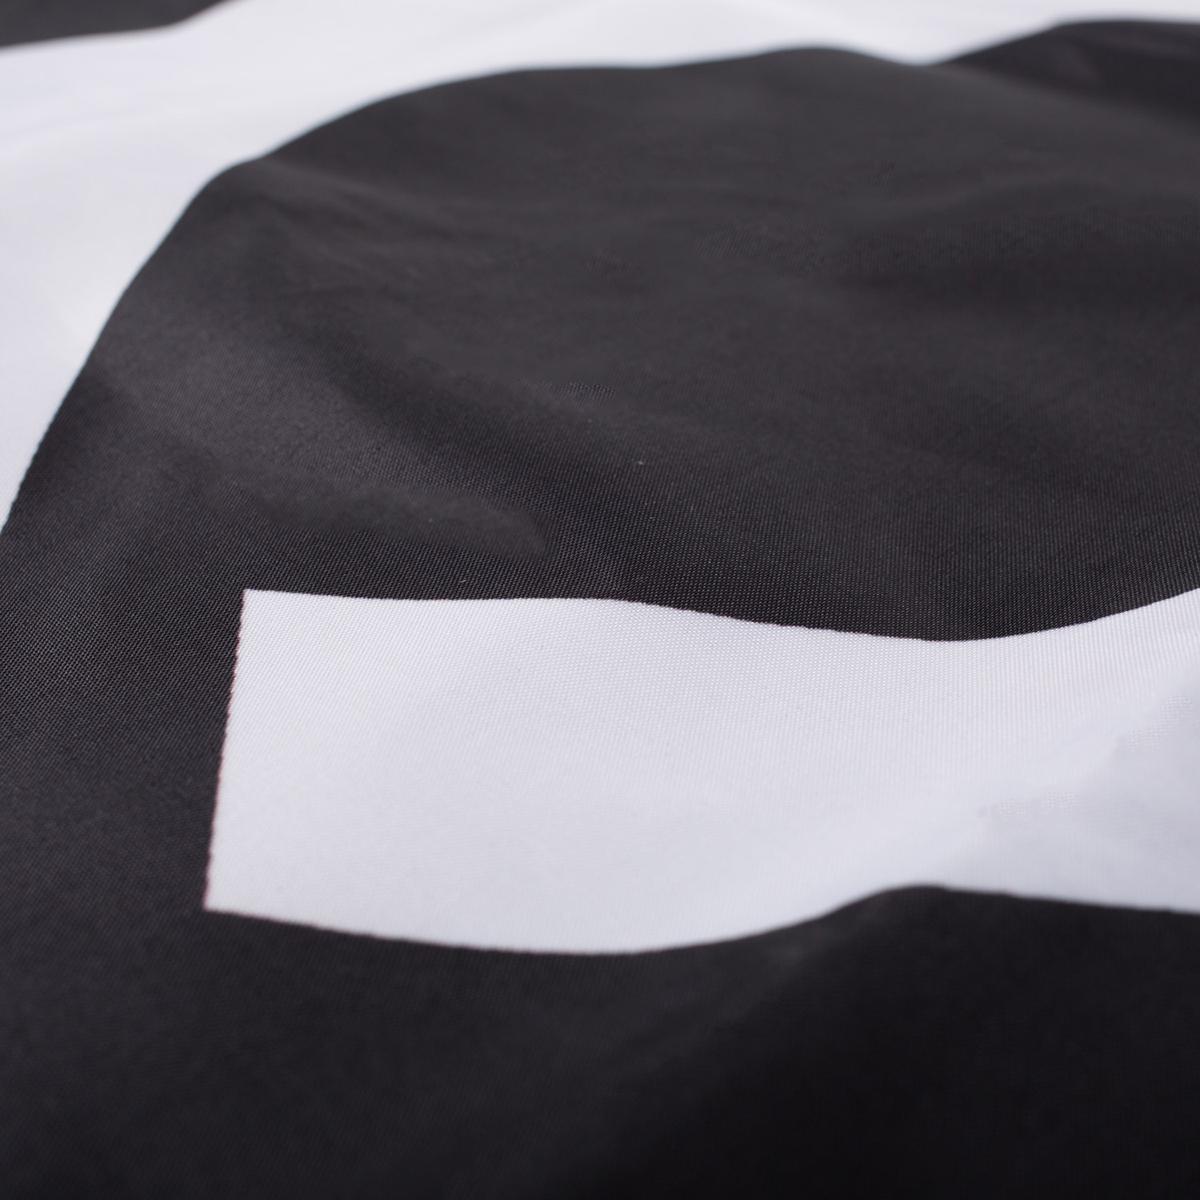 Logo Double-Sided Flag - Black/White